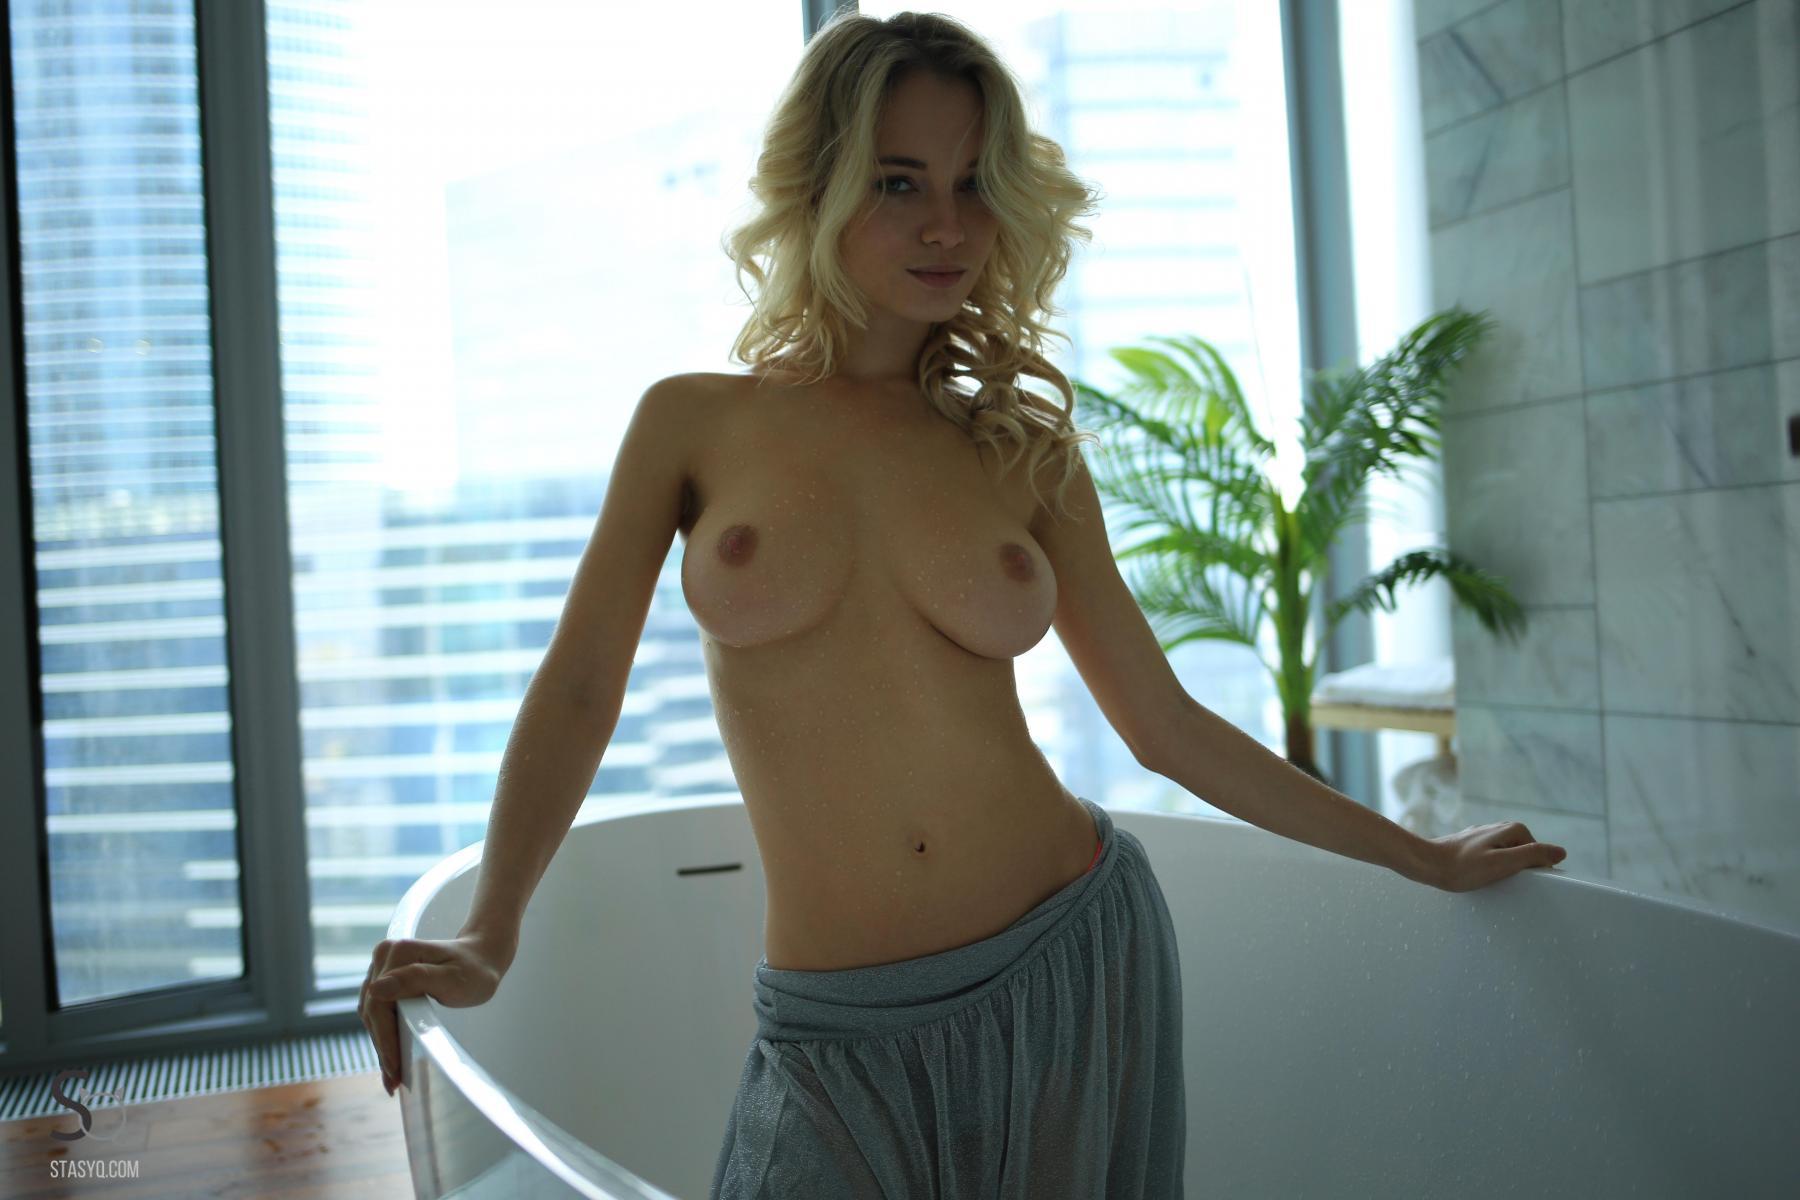 monroq-blonde-boobs-naked-bathroom-window-stasyq-20